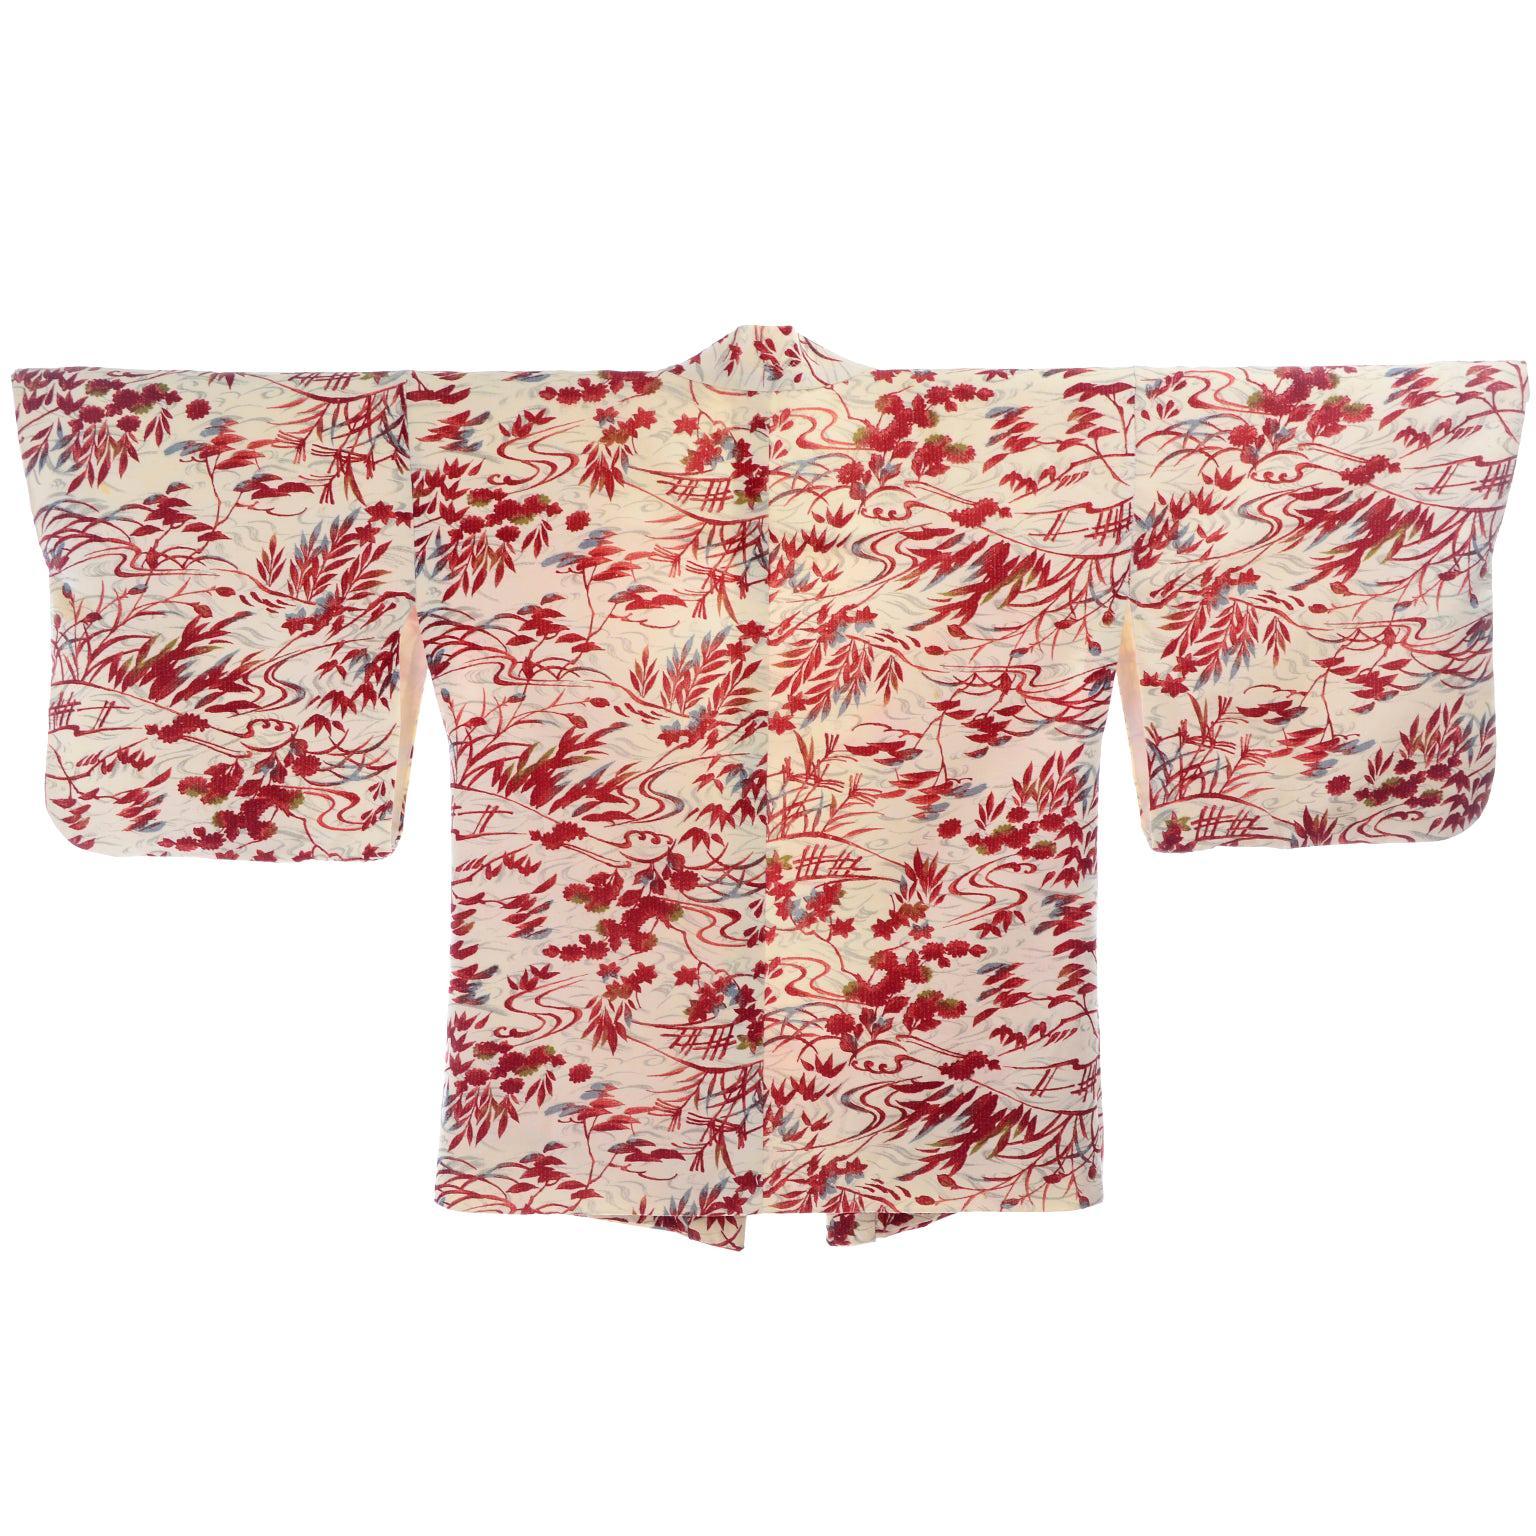 1930s Vintage Red & Cream Haori Silk Kimono Jacket